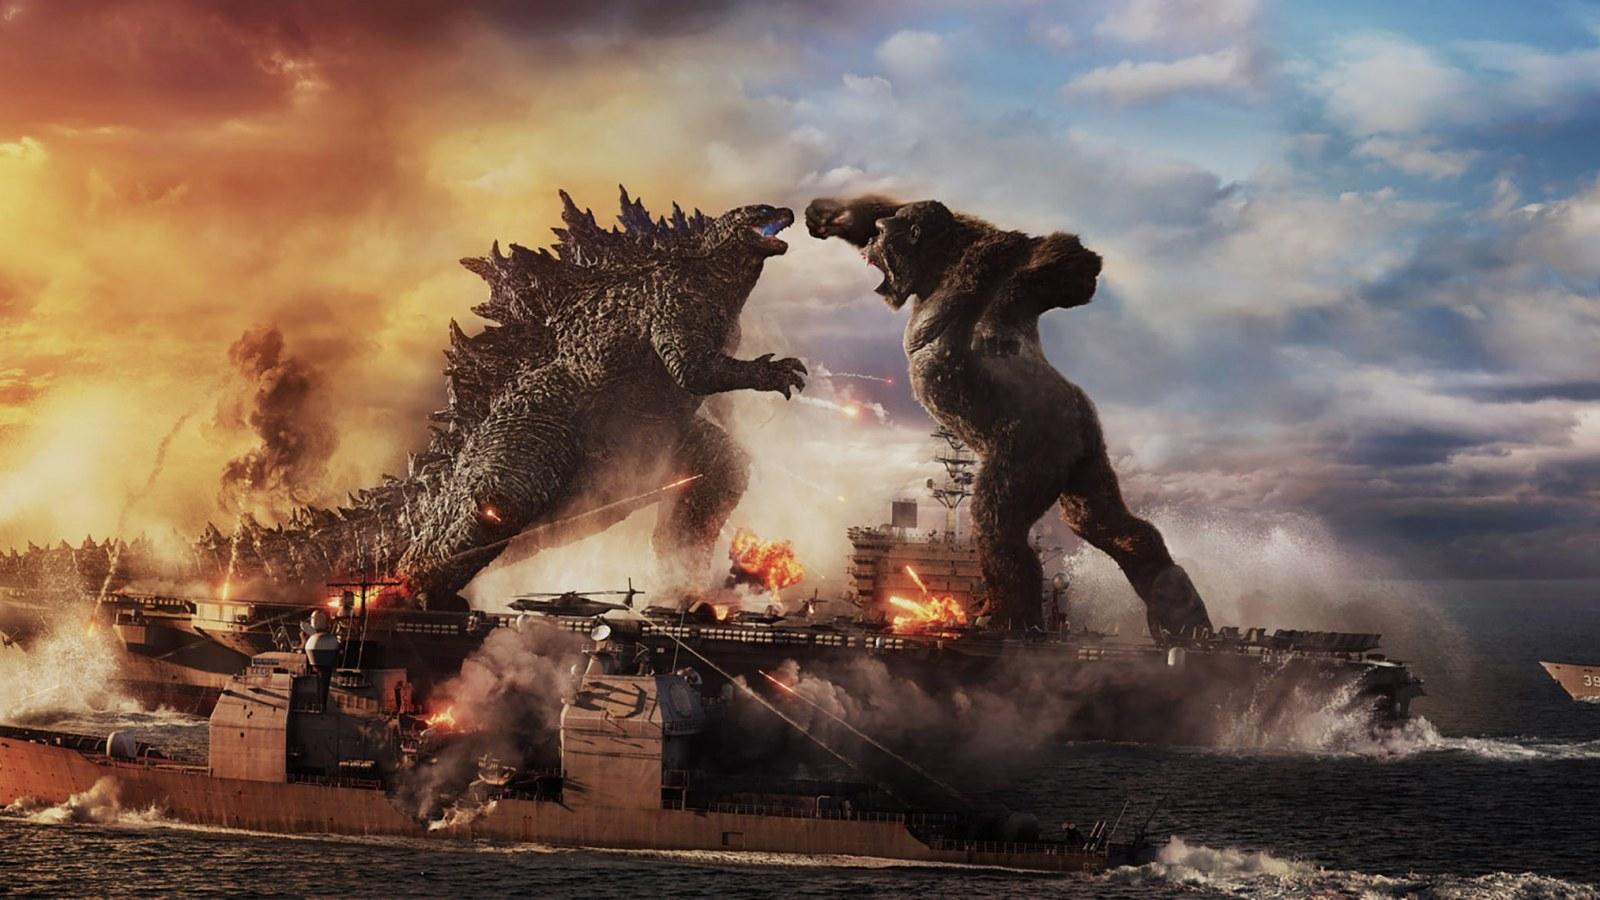 Godzilla vs Kong Giveaway